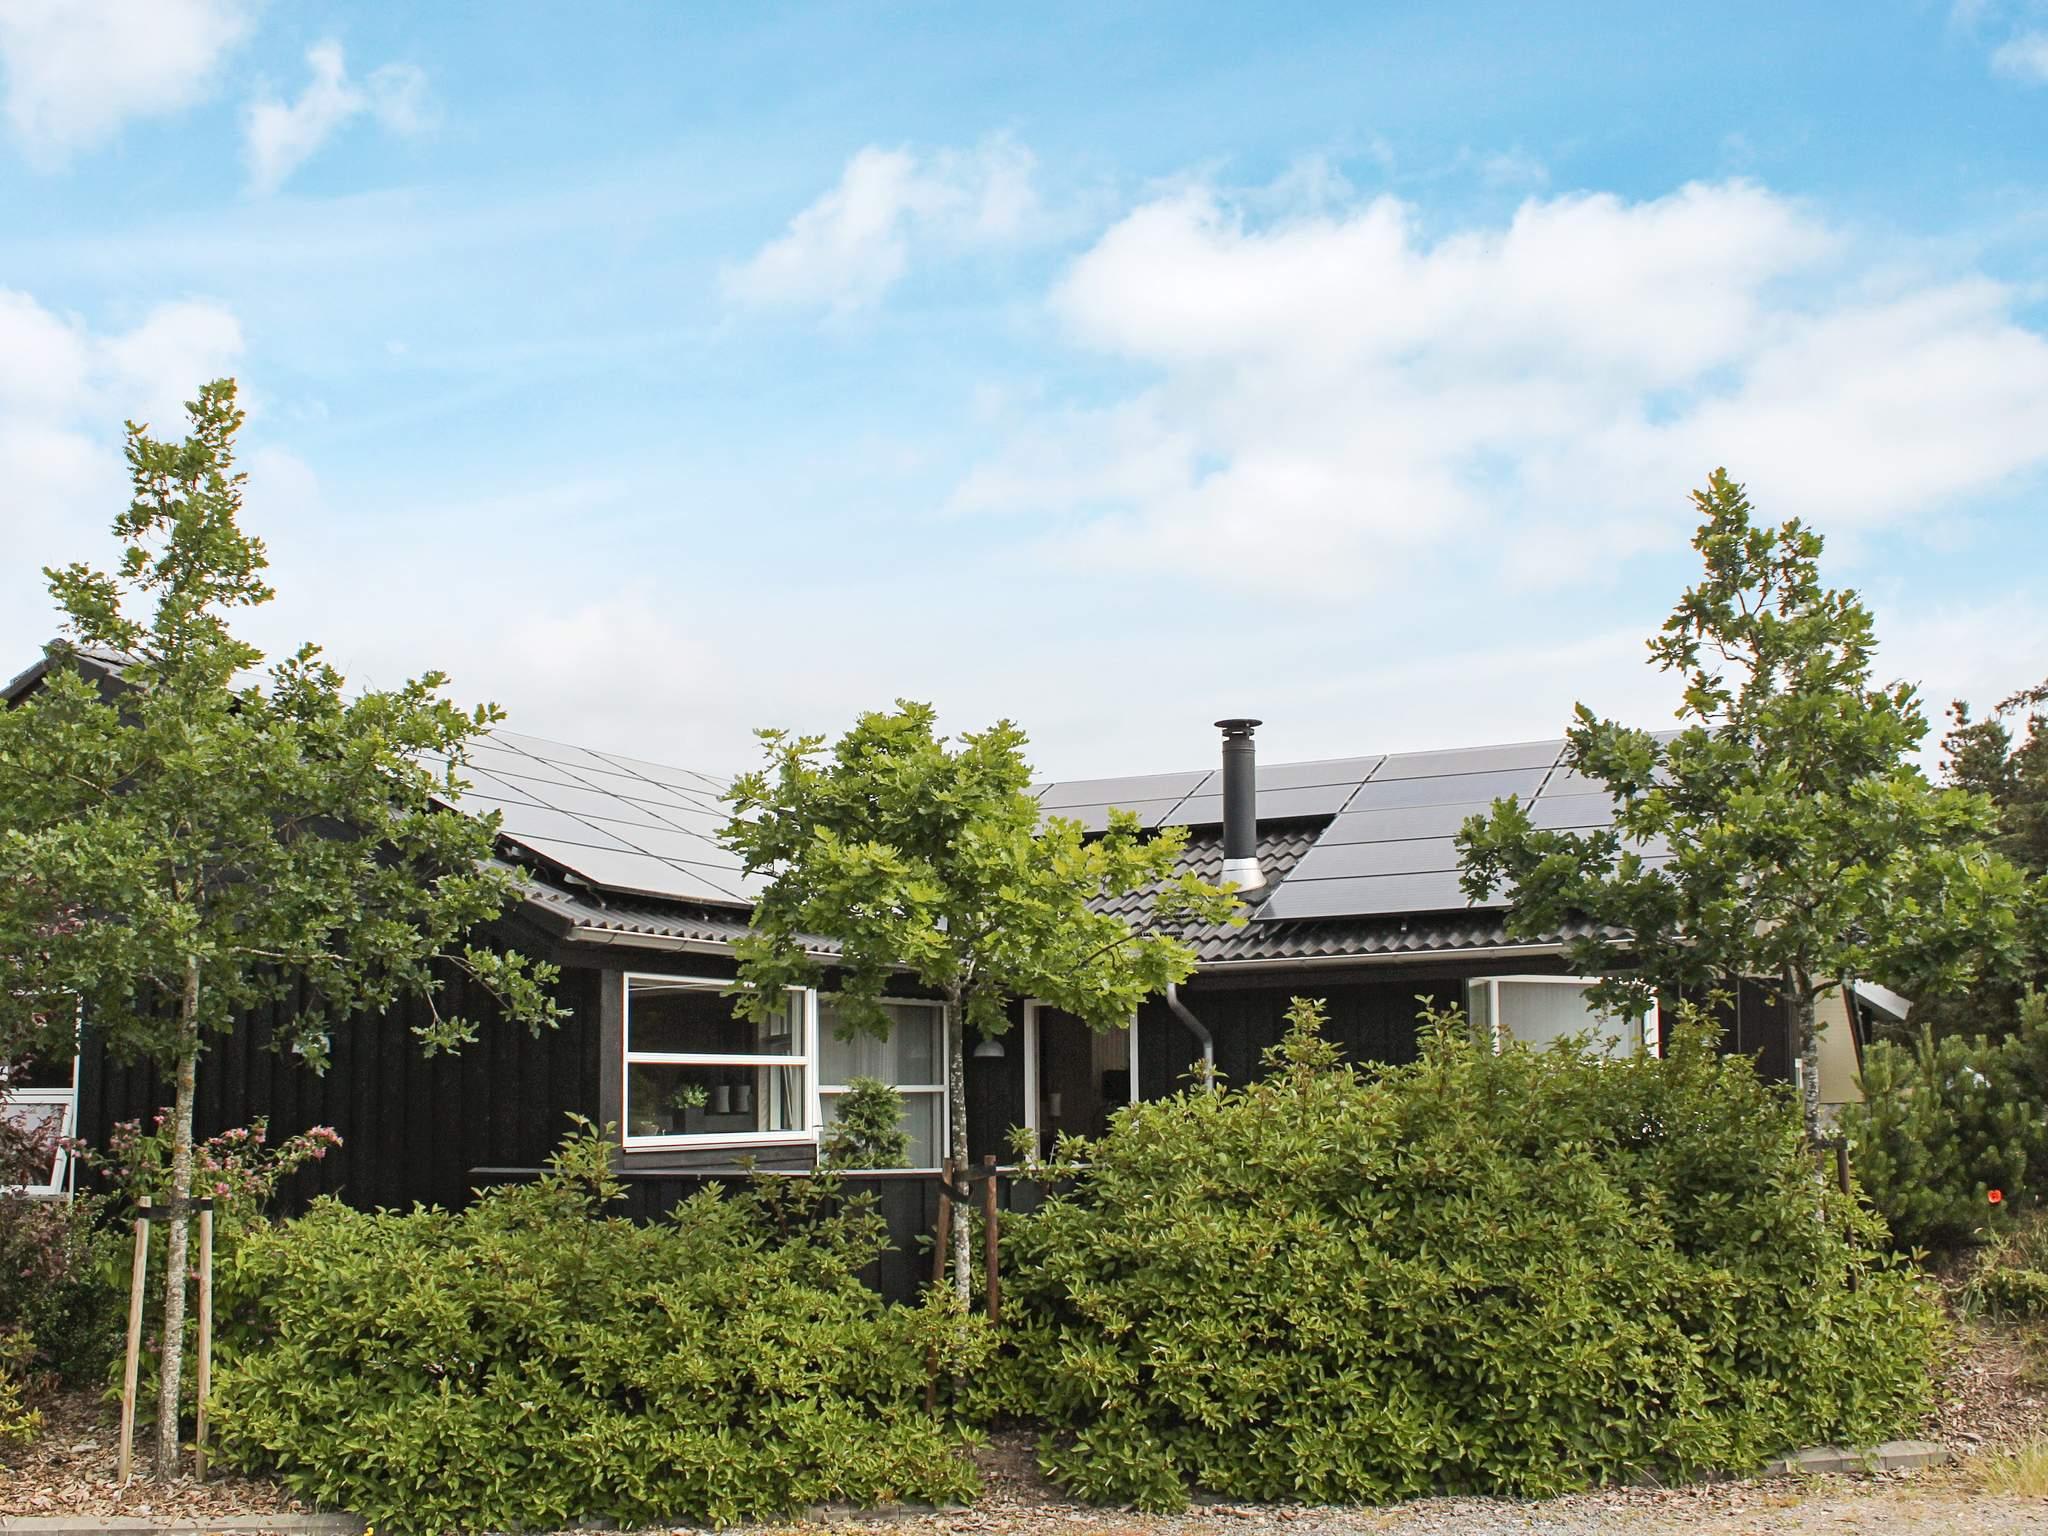 Ferienhaus Blåvand (335970), Blåvand, , Westjütland, Dänemark, Bild 23